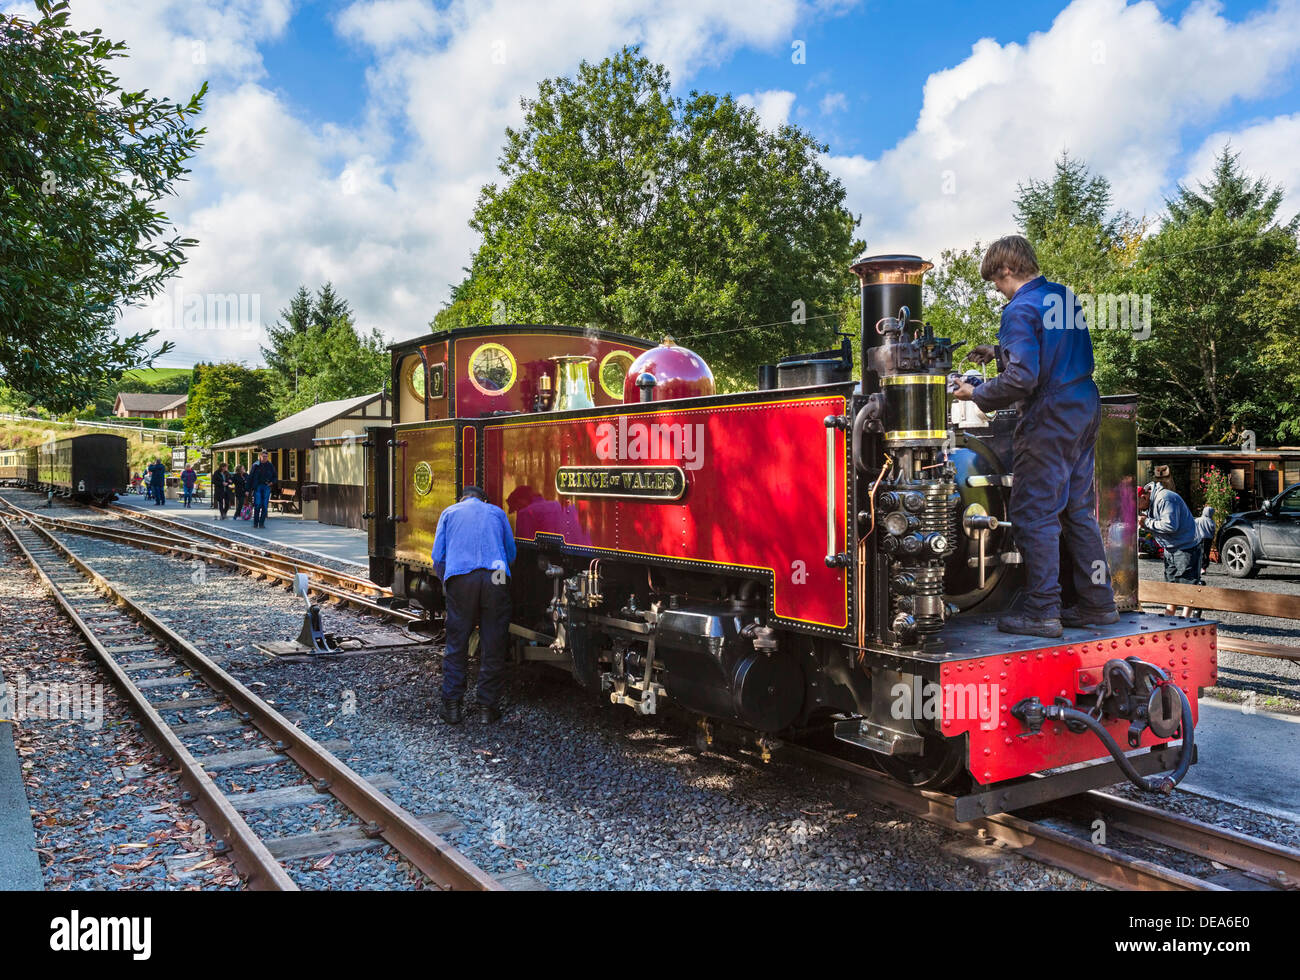 Men working on 'Prince of Wales' steam train at Devil's Bridge railway station, Vale of Rheidol Railway, Ceredigion, Wales, UK - Stock Image